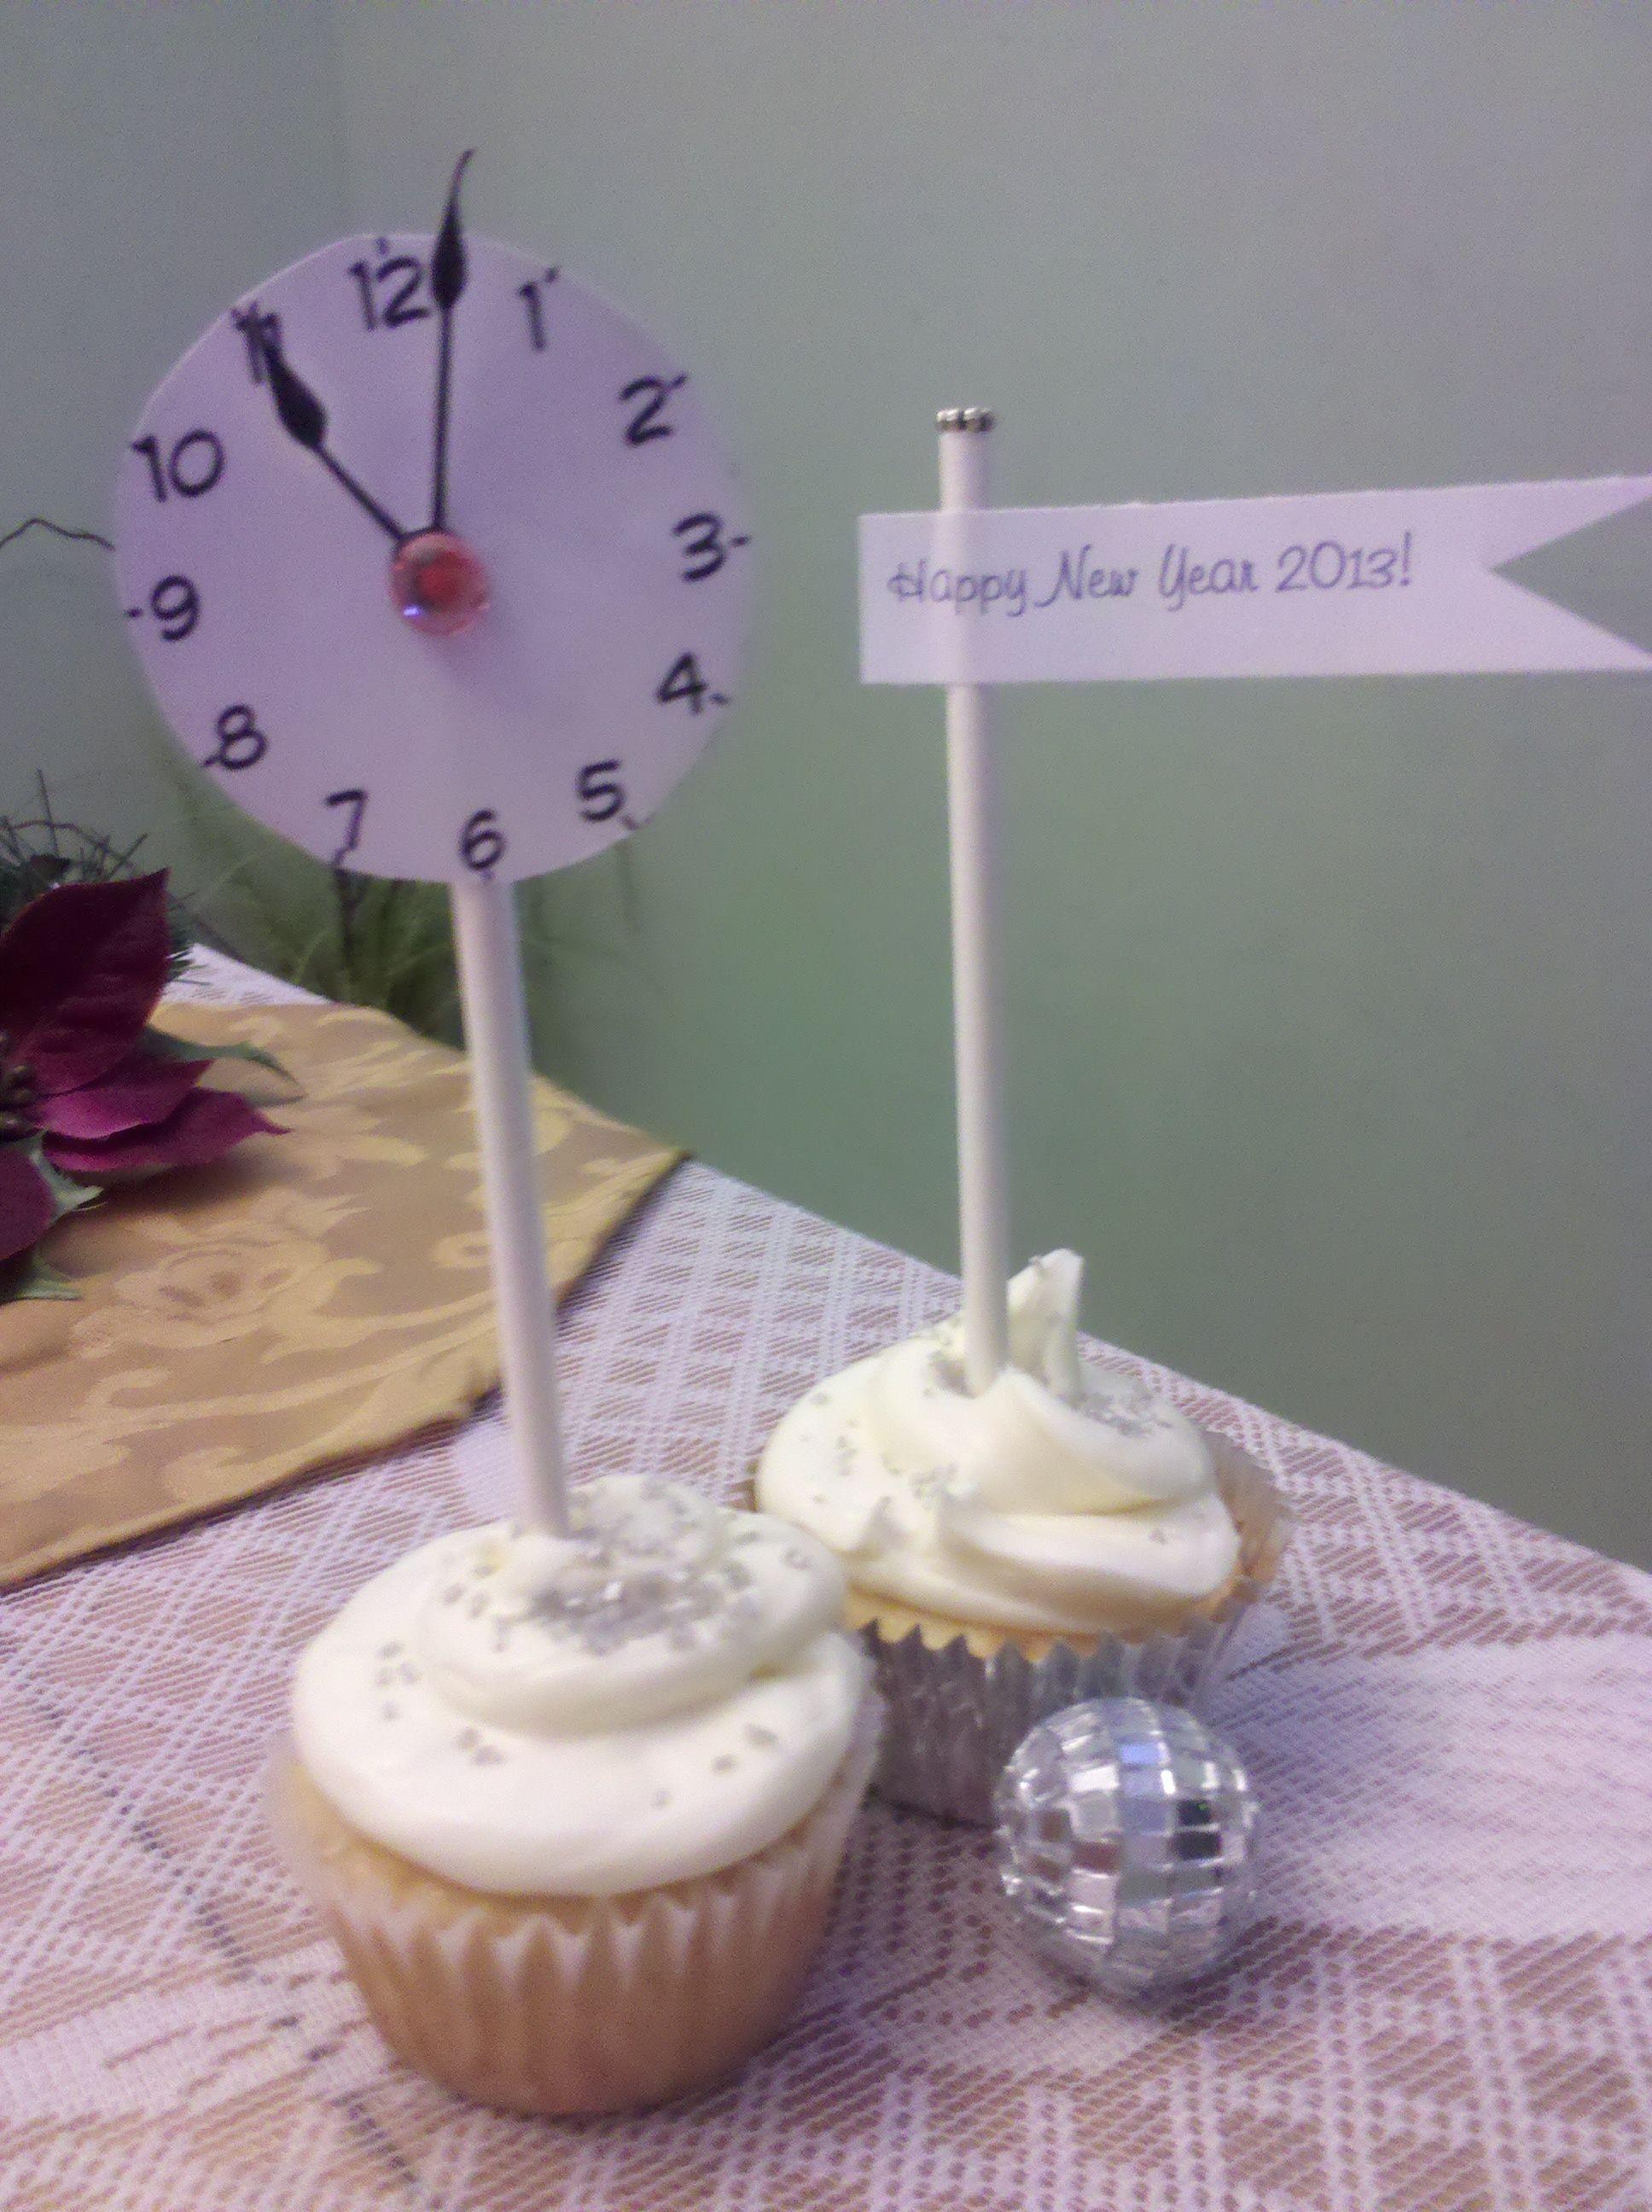 New Years cupcakes